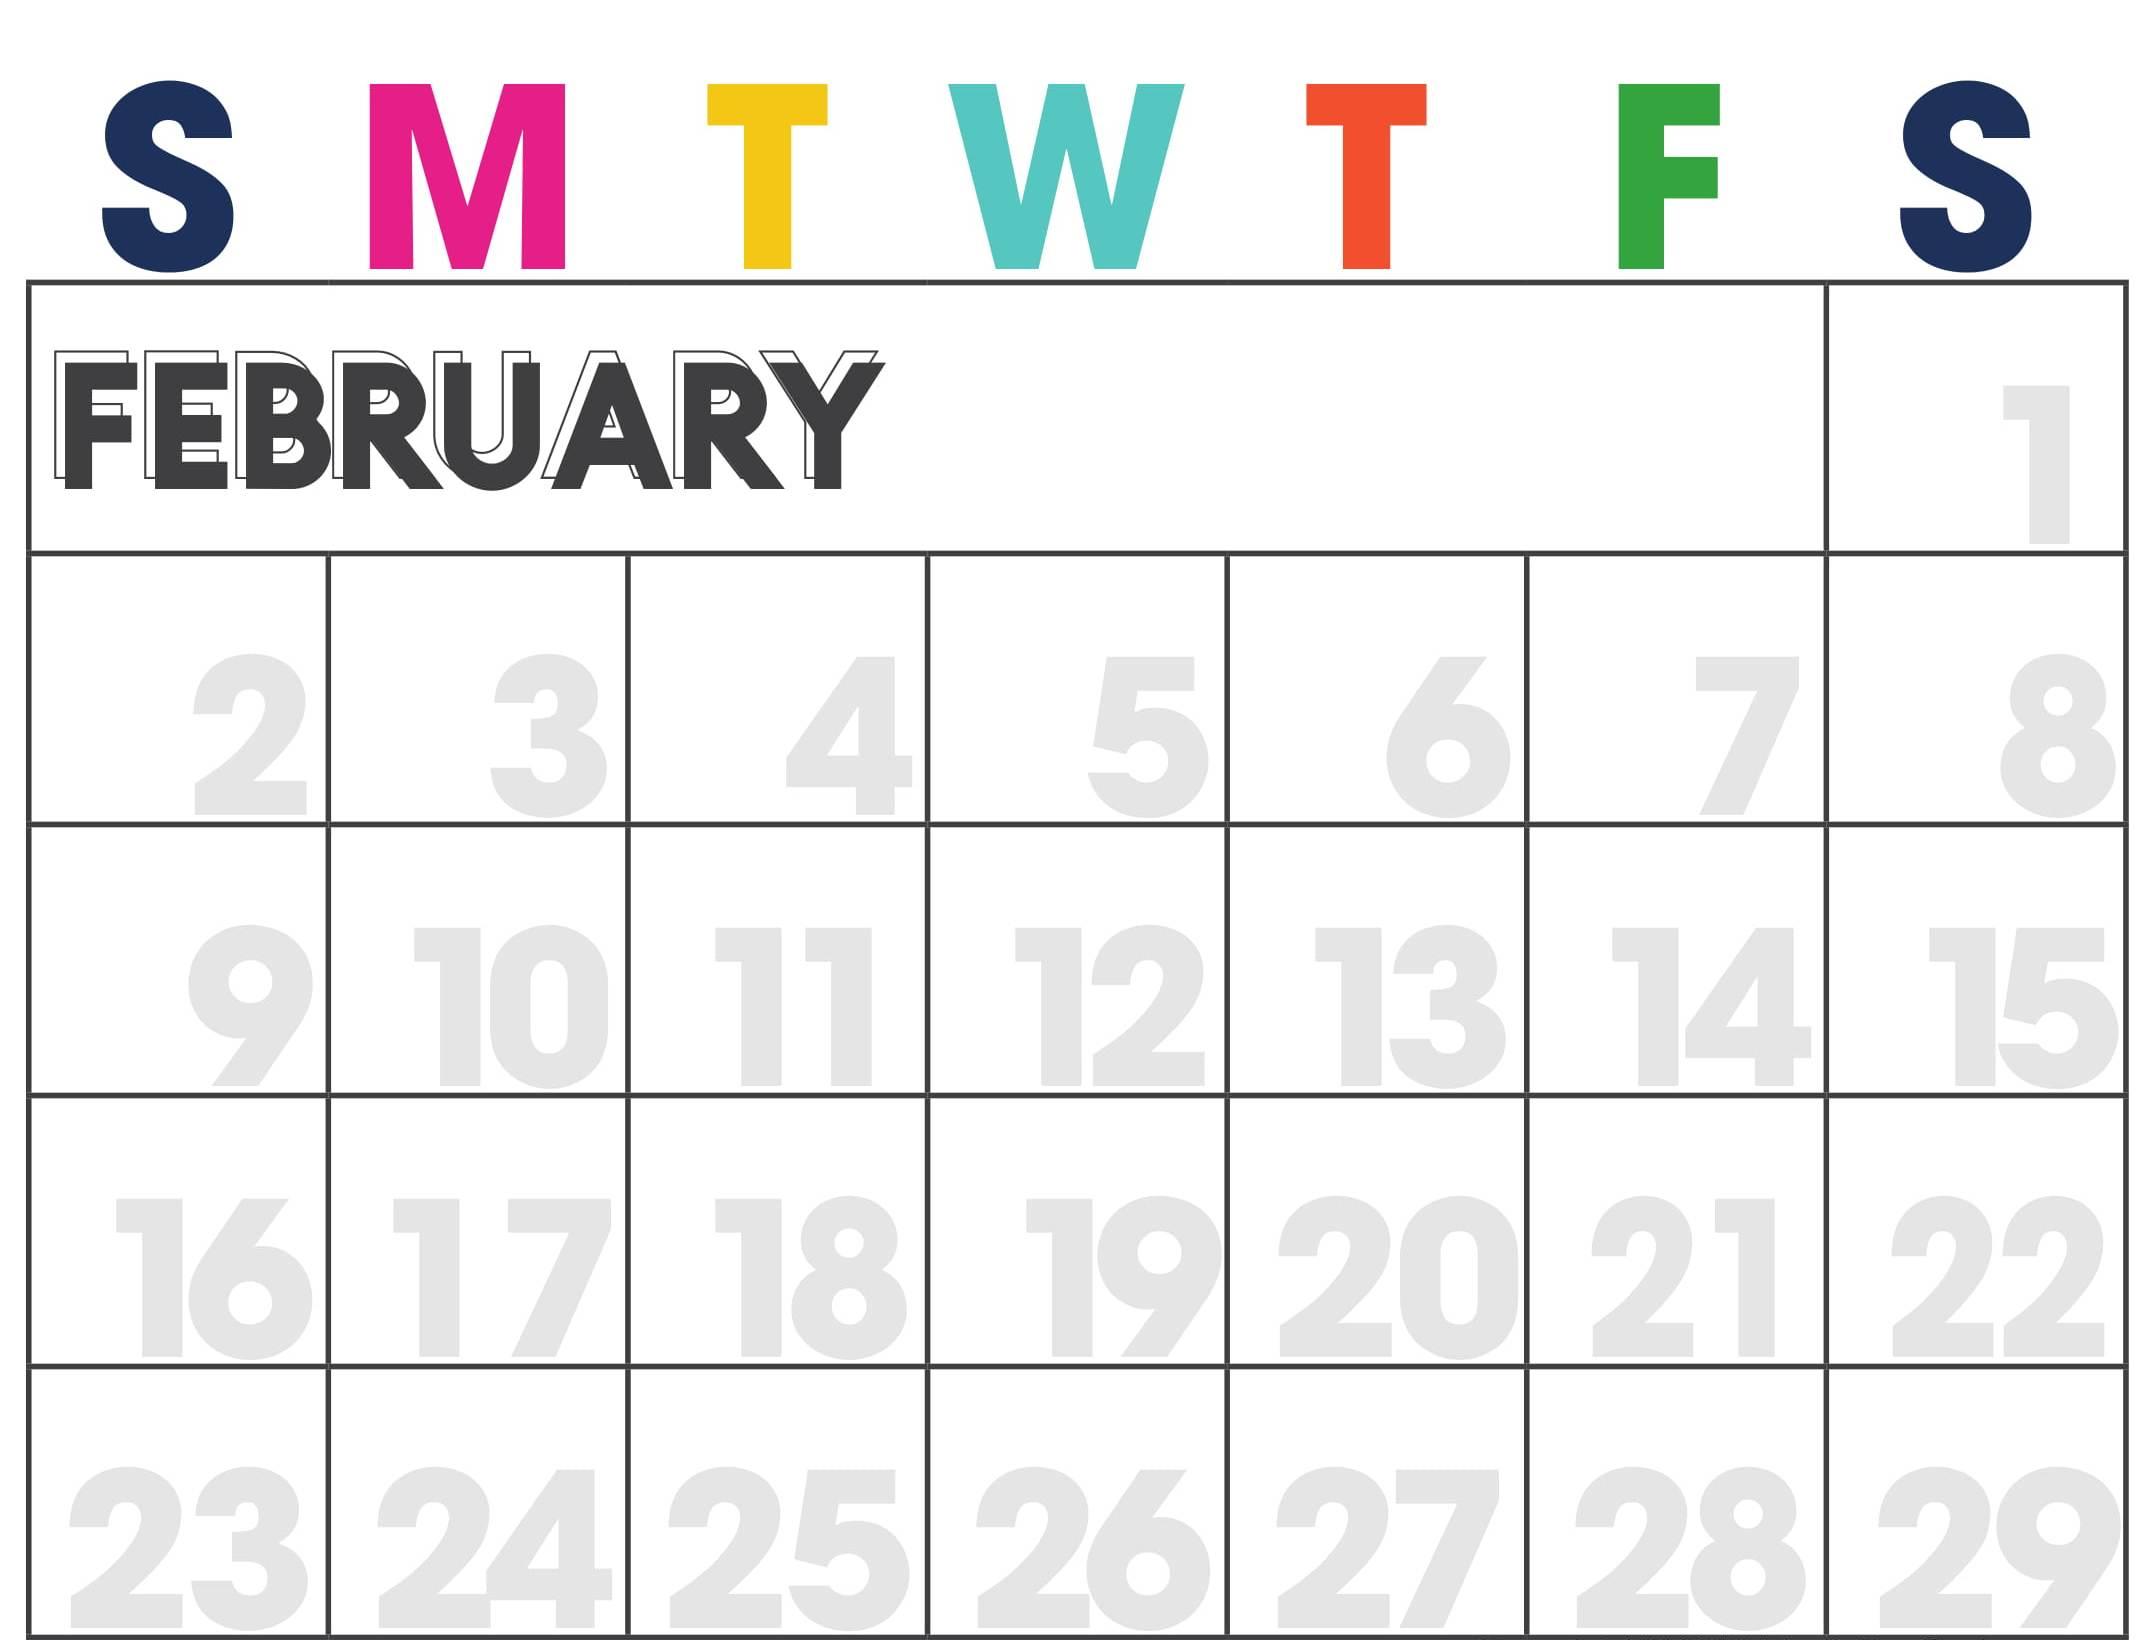 February 2020 Calendar Cute